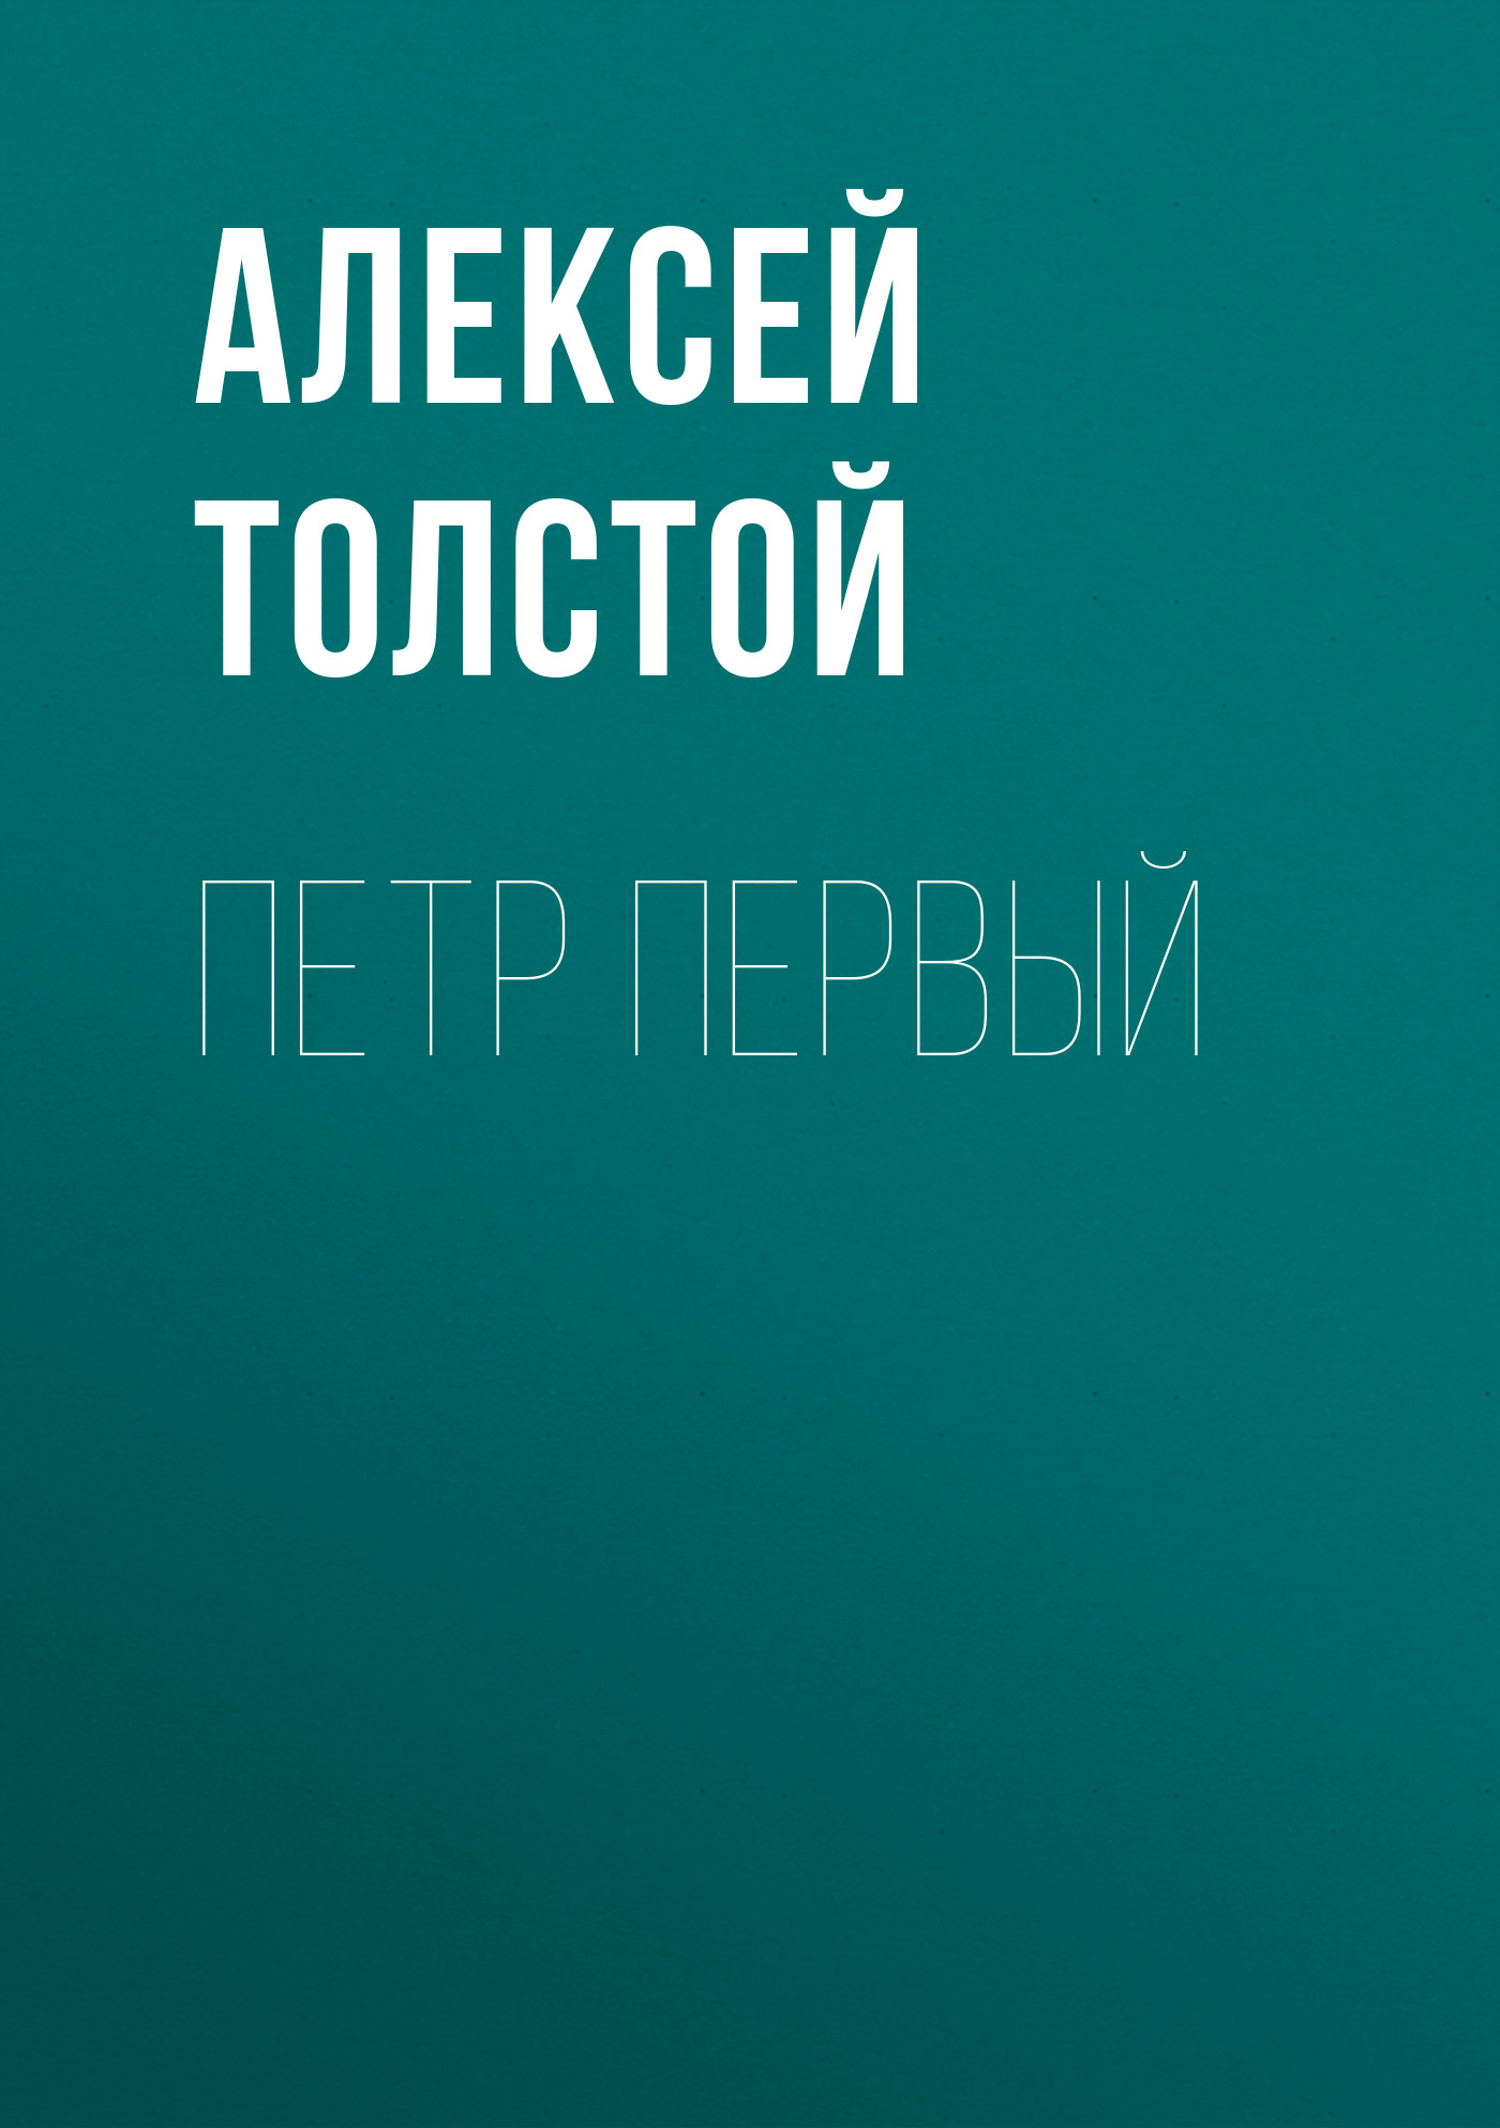 Алексей Толстой Петр Первый алексей толстой петр первый